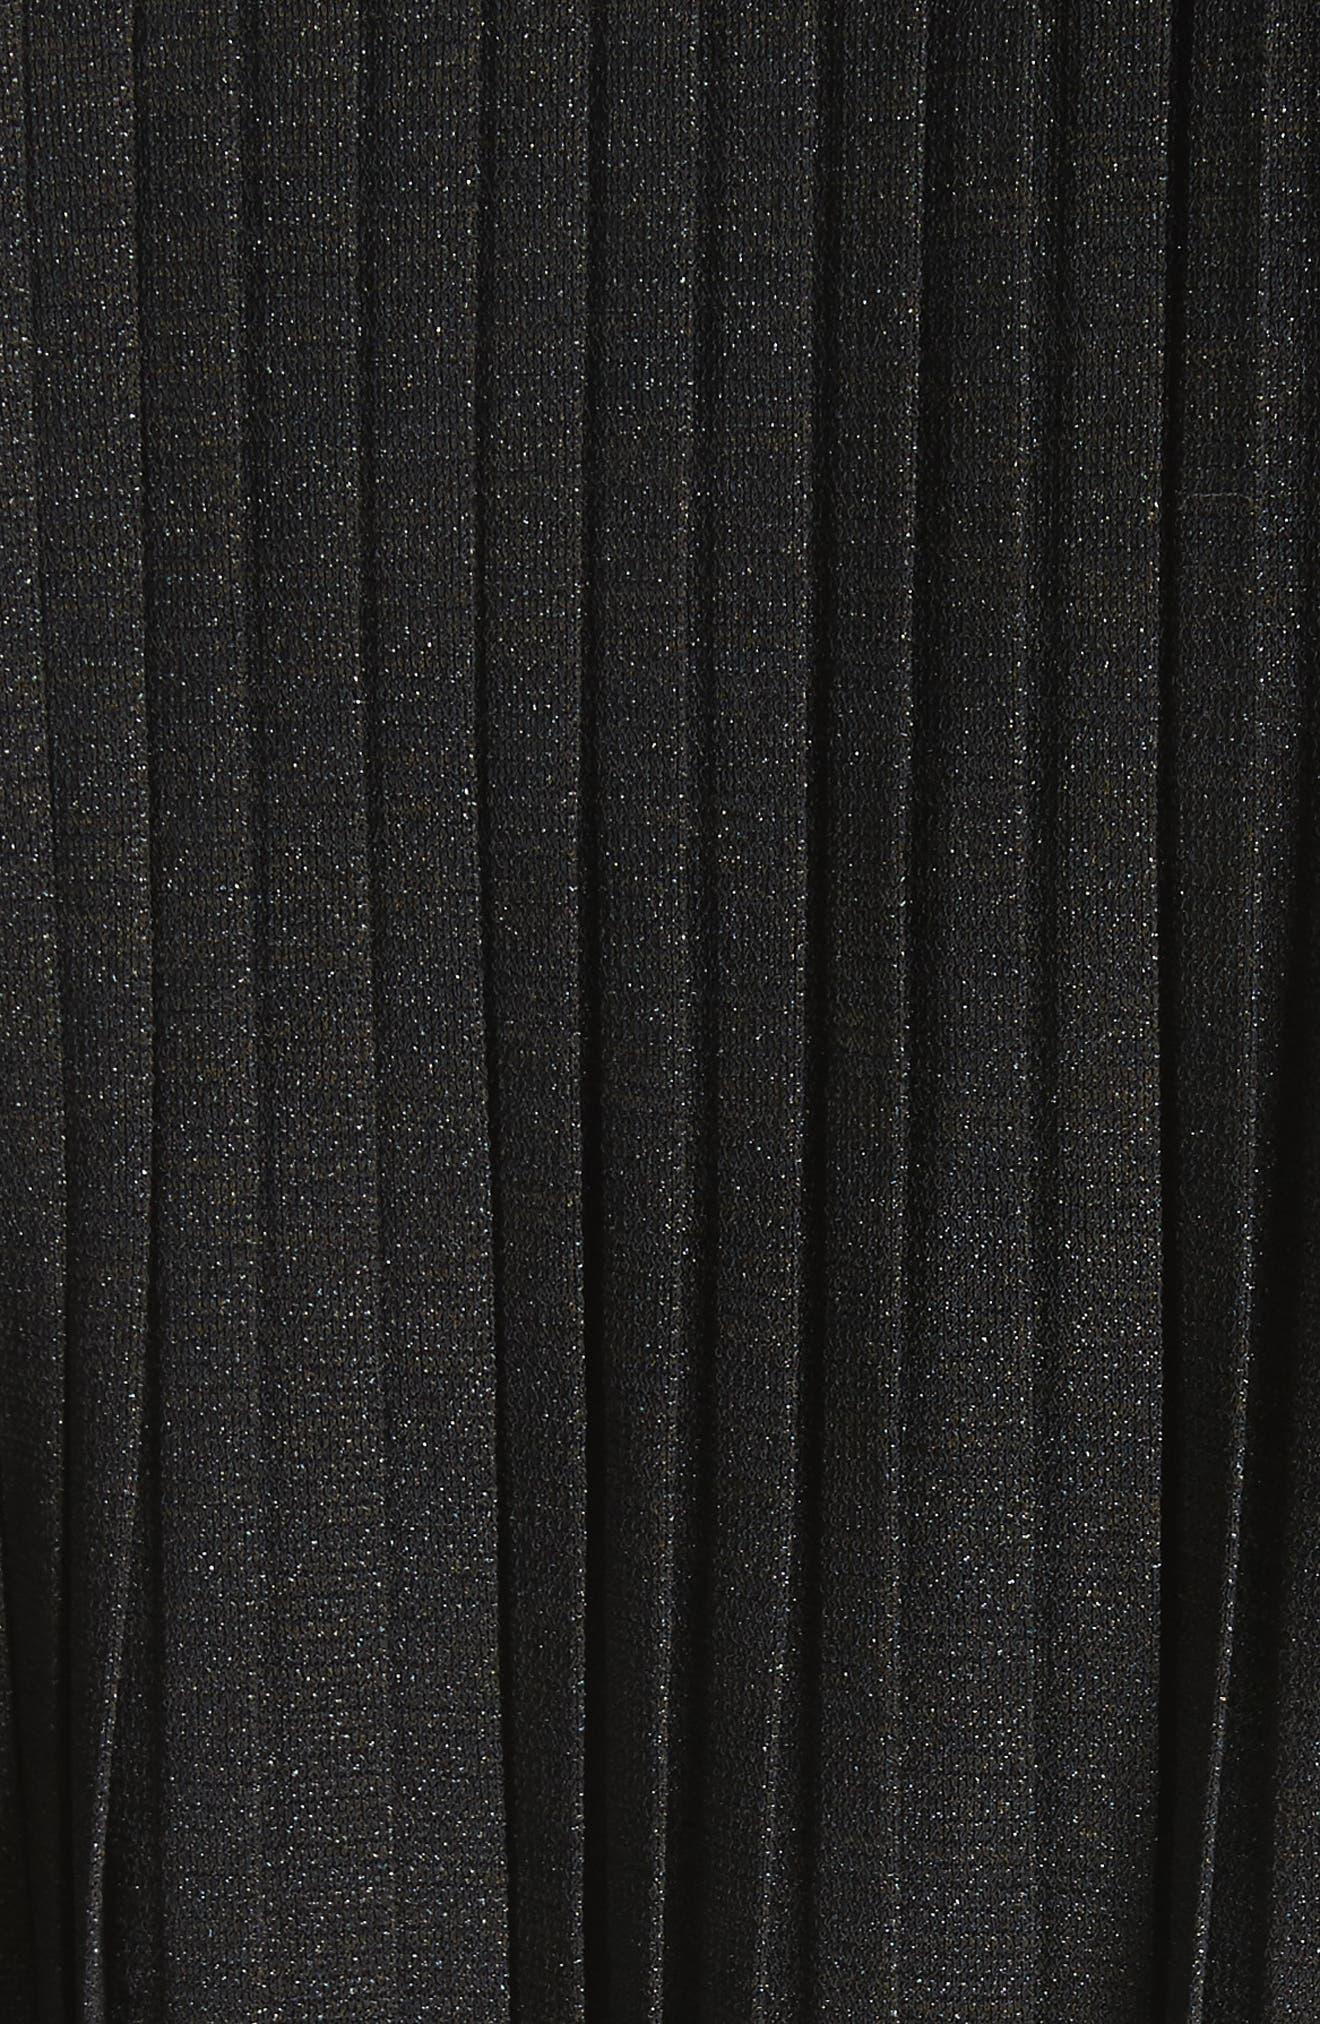 Slit Sleeve Peasant Top,                             Alternate thumbnail 5, color,                             Black